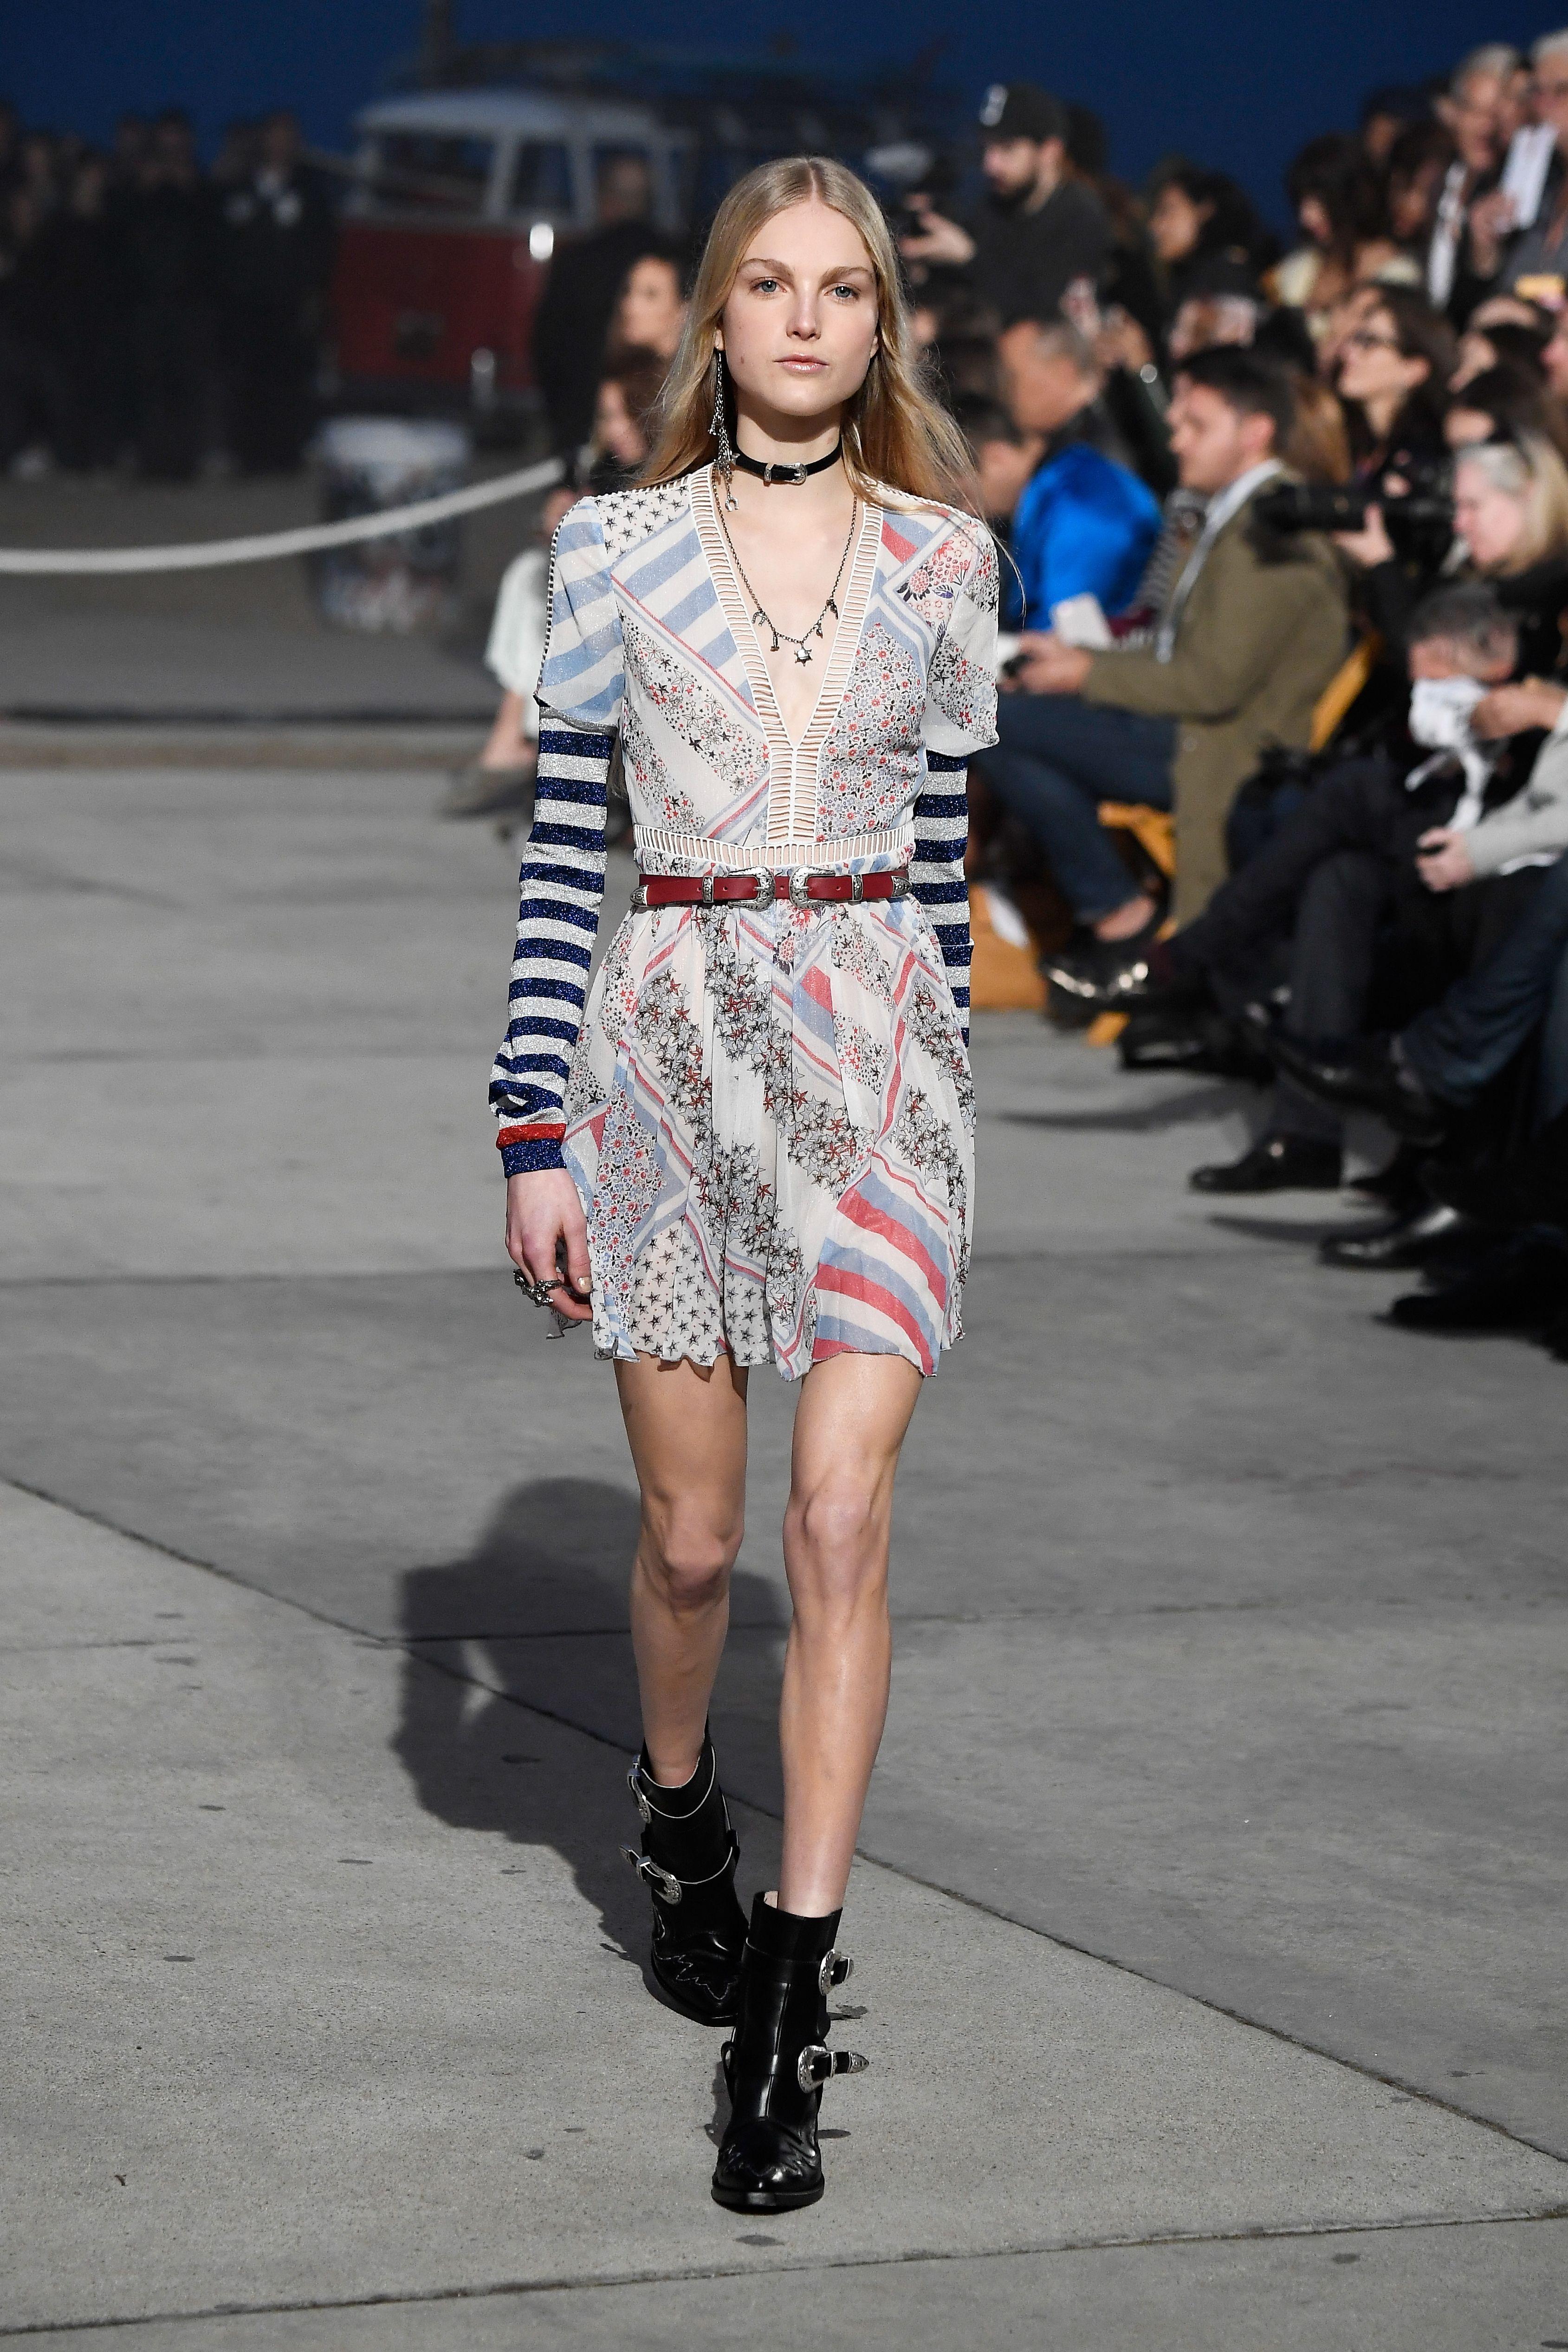 d31445046 Kirin Dejonckheere masters luxe layering in #TOMMYXGIGI Fur Skirt, Tommy  Hilfiger Fashion, Fashion